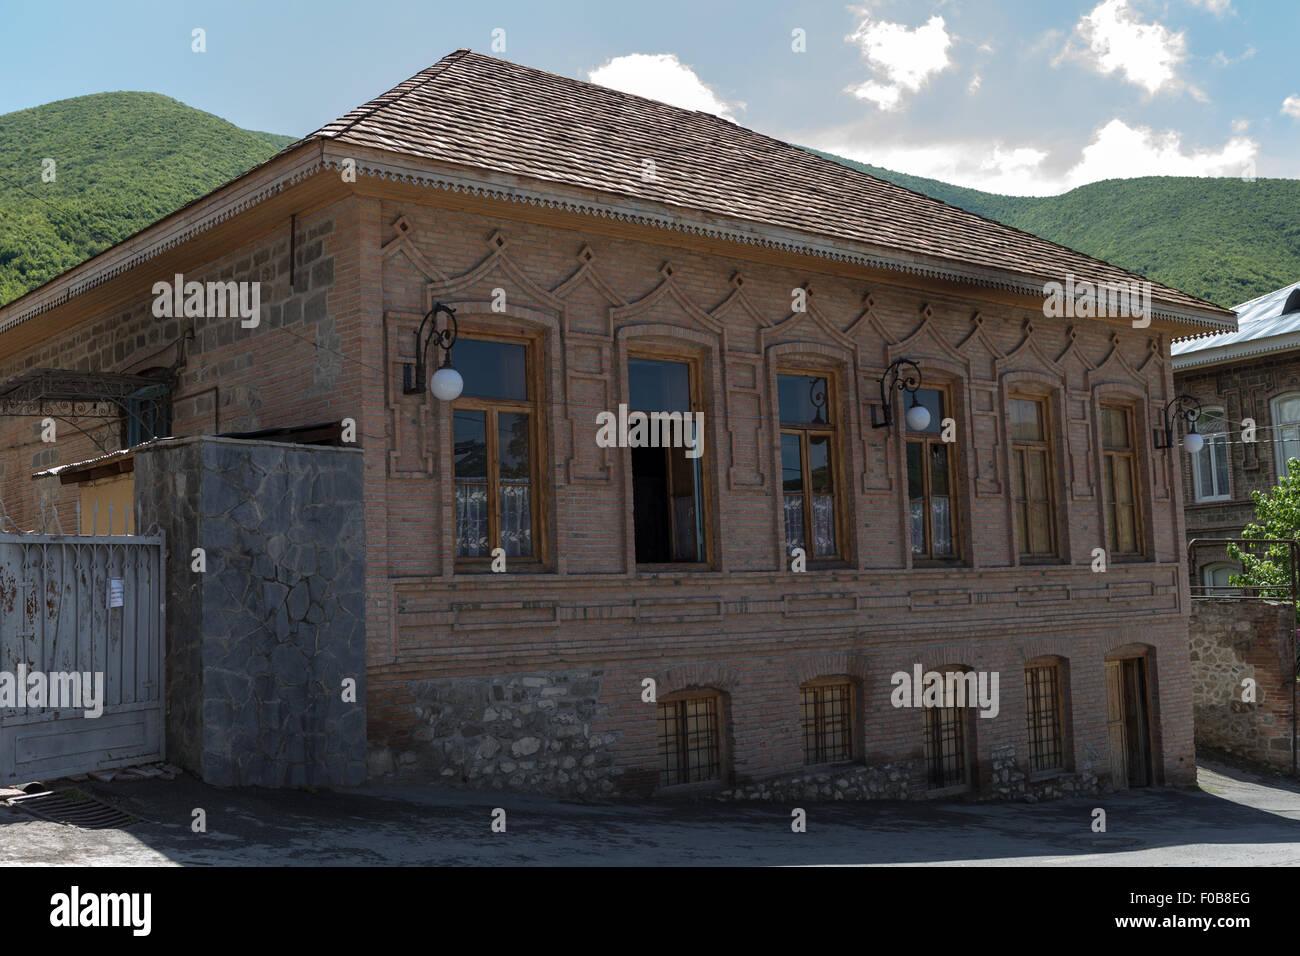 Brick buildings Sheki Azerbaijan - Stock Image